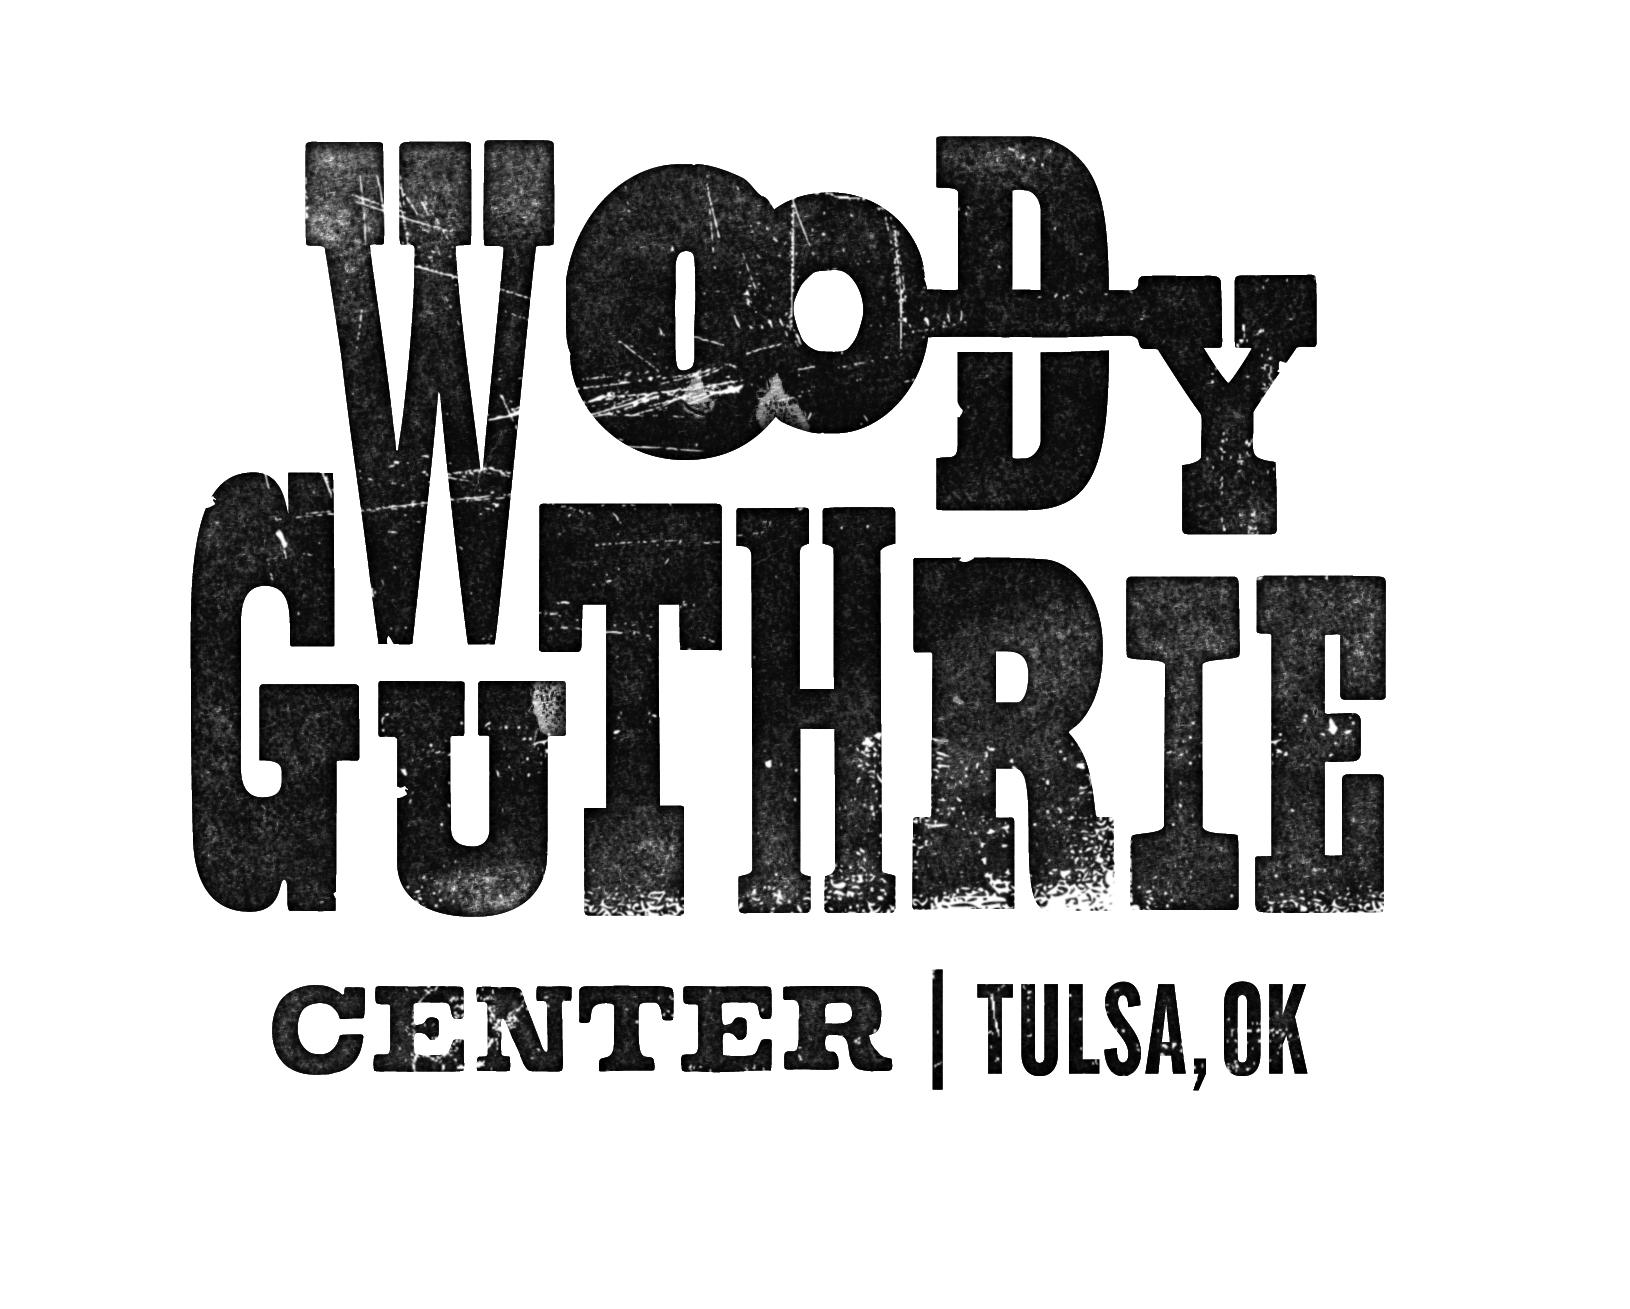 Logo for the Woody Guthrie Center Tulsa OK